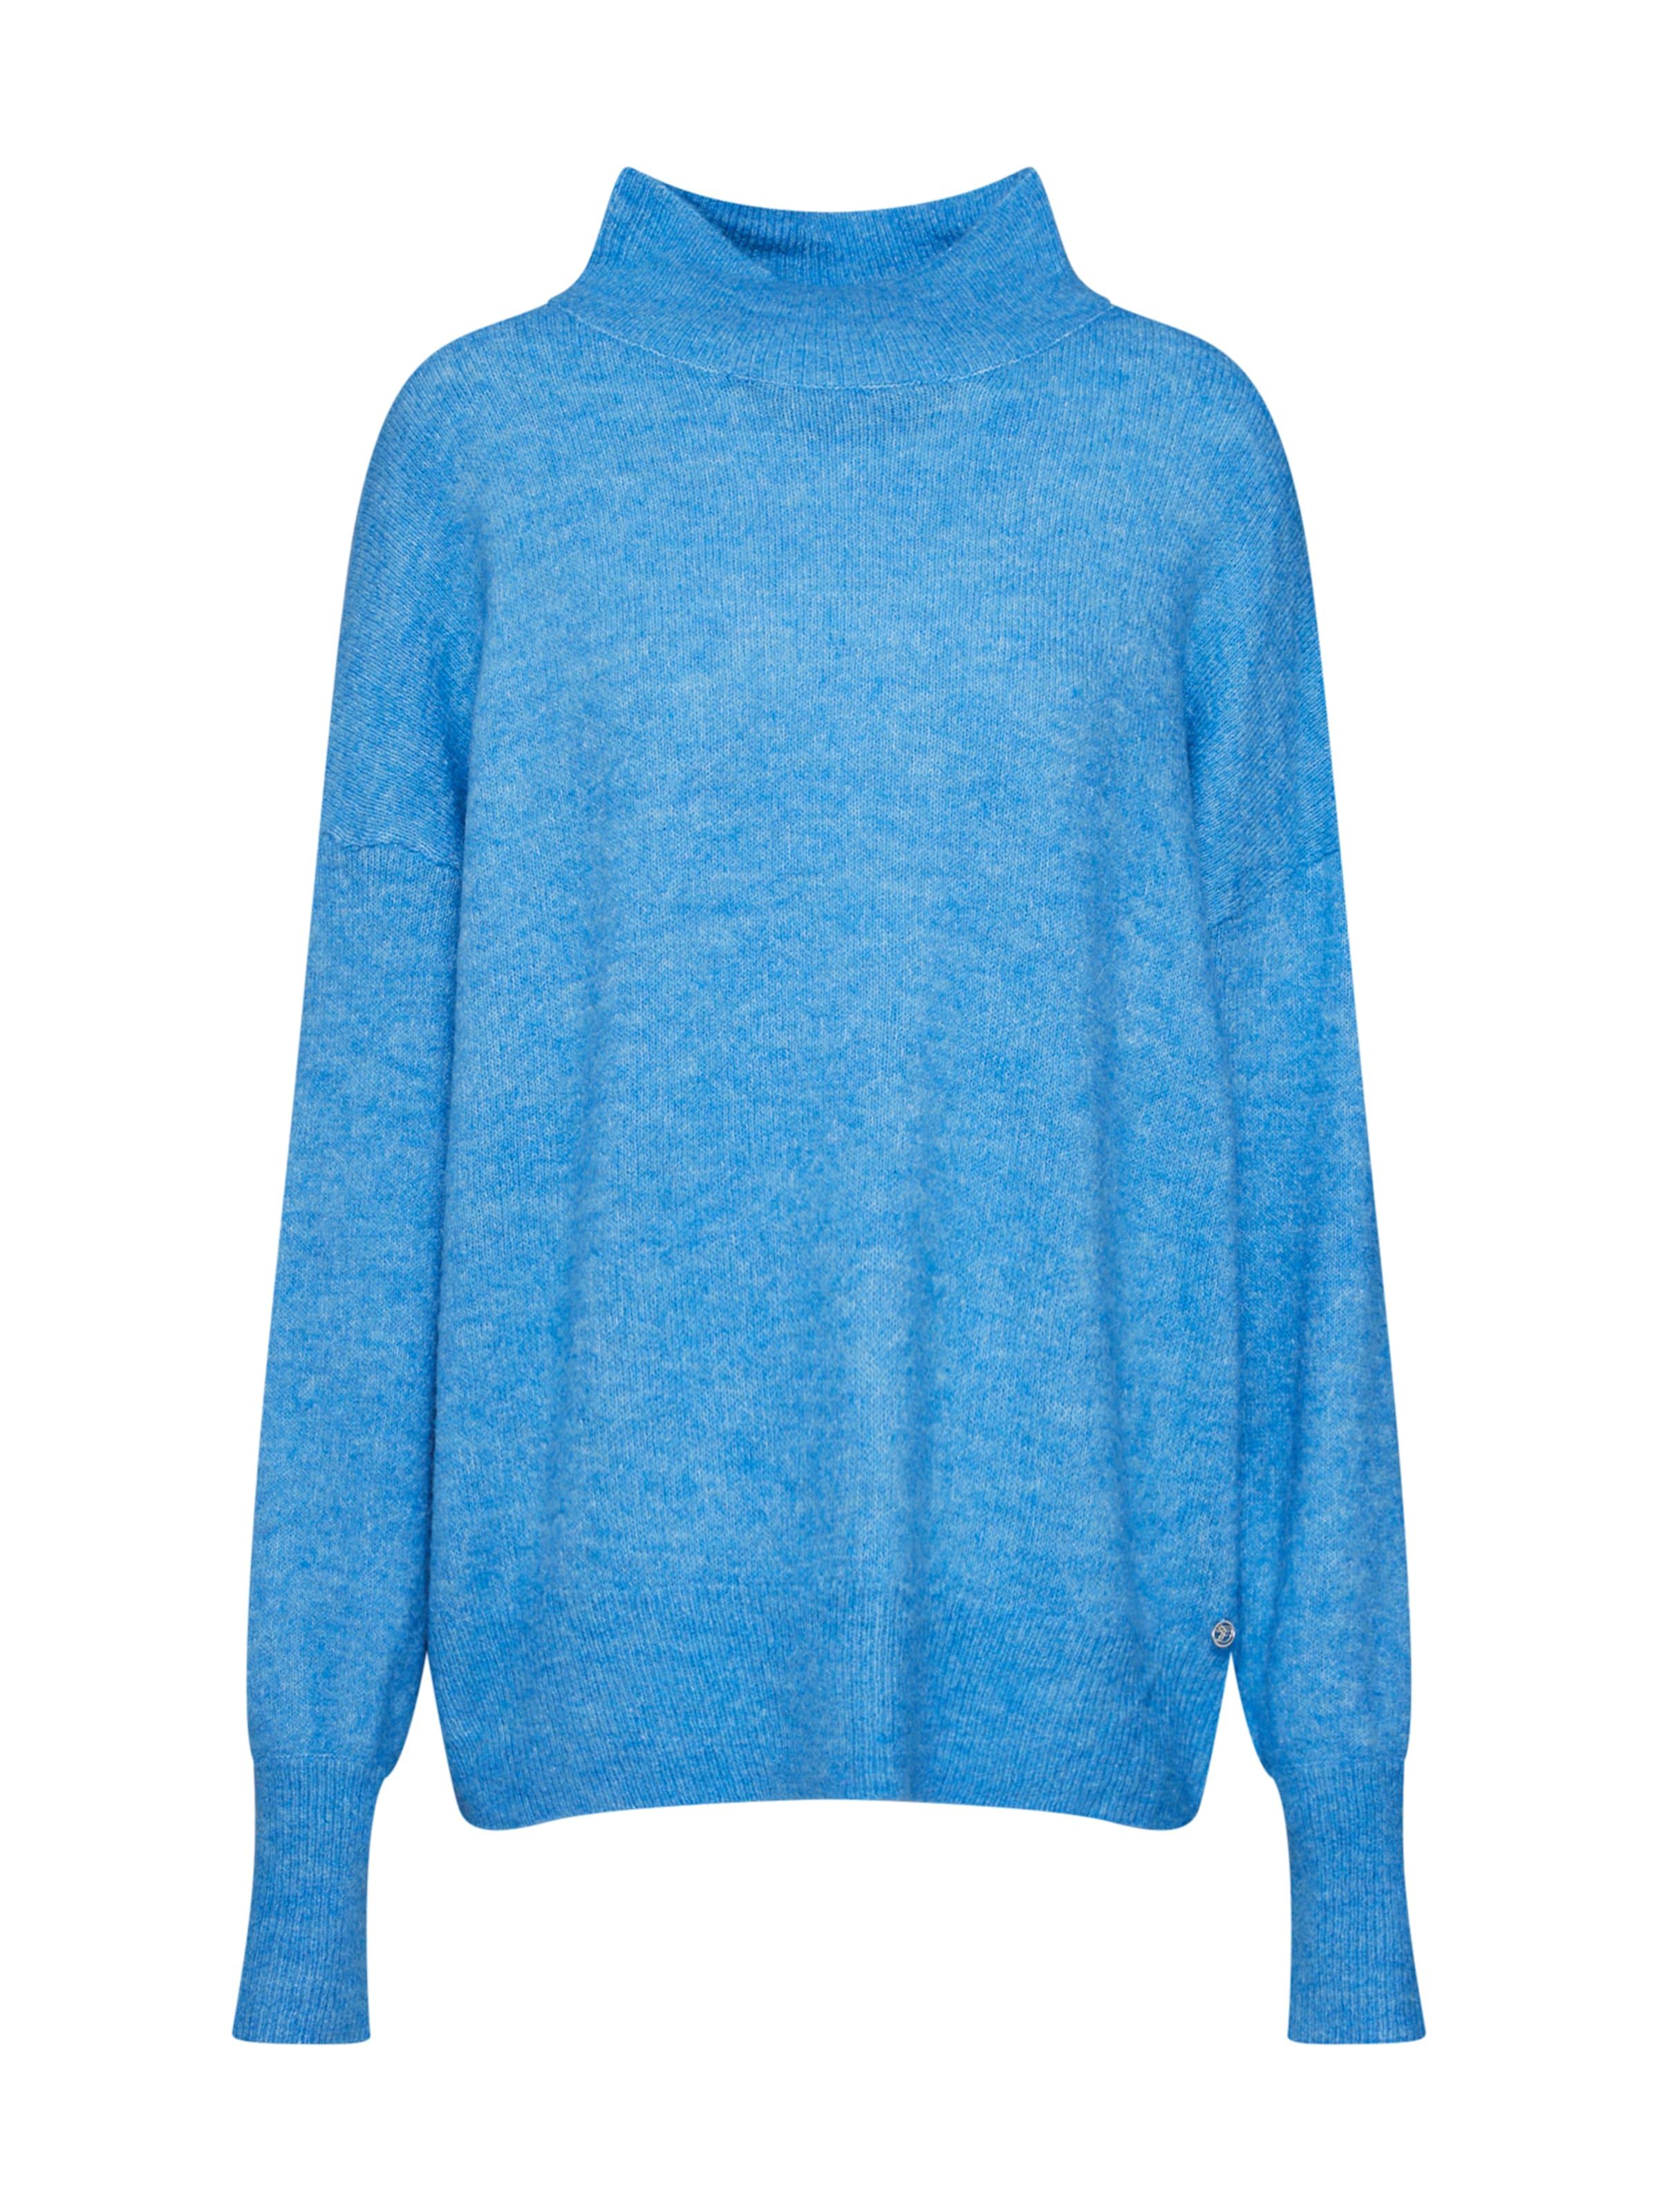 Bleu Denim Neck Tailor Pull En Pullover' Tom Ciel 'cozy over Turtle odxeCB